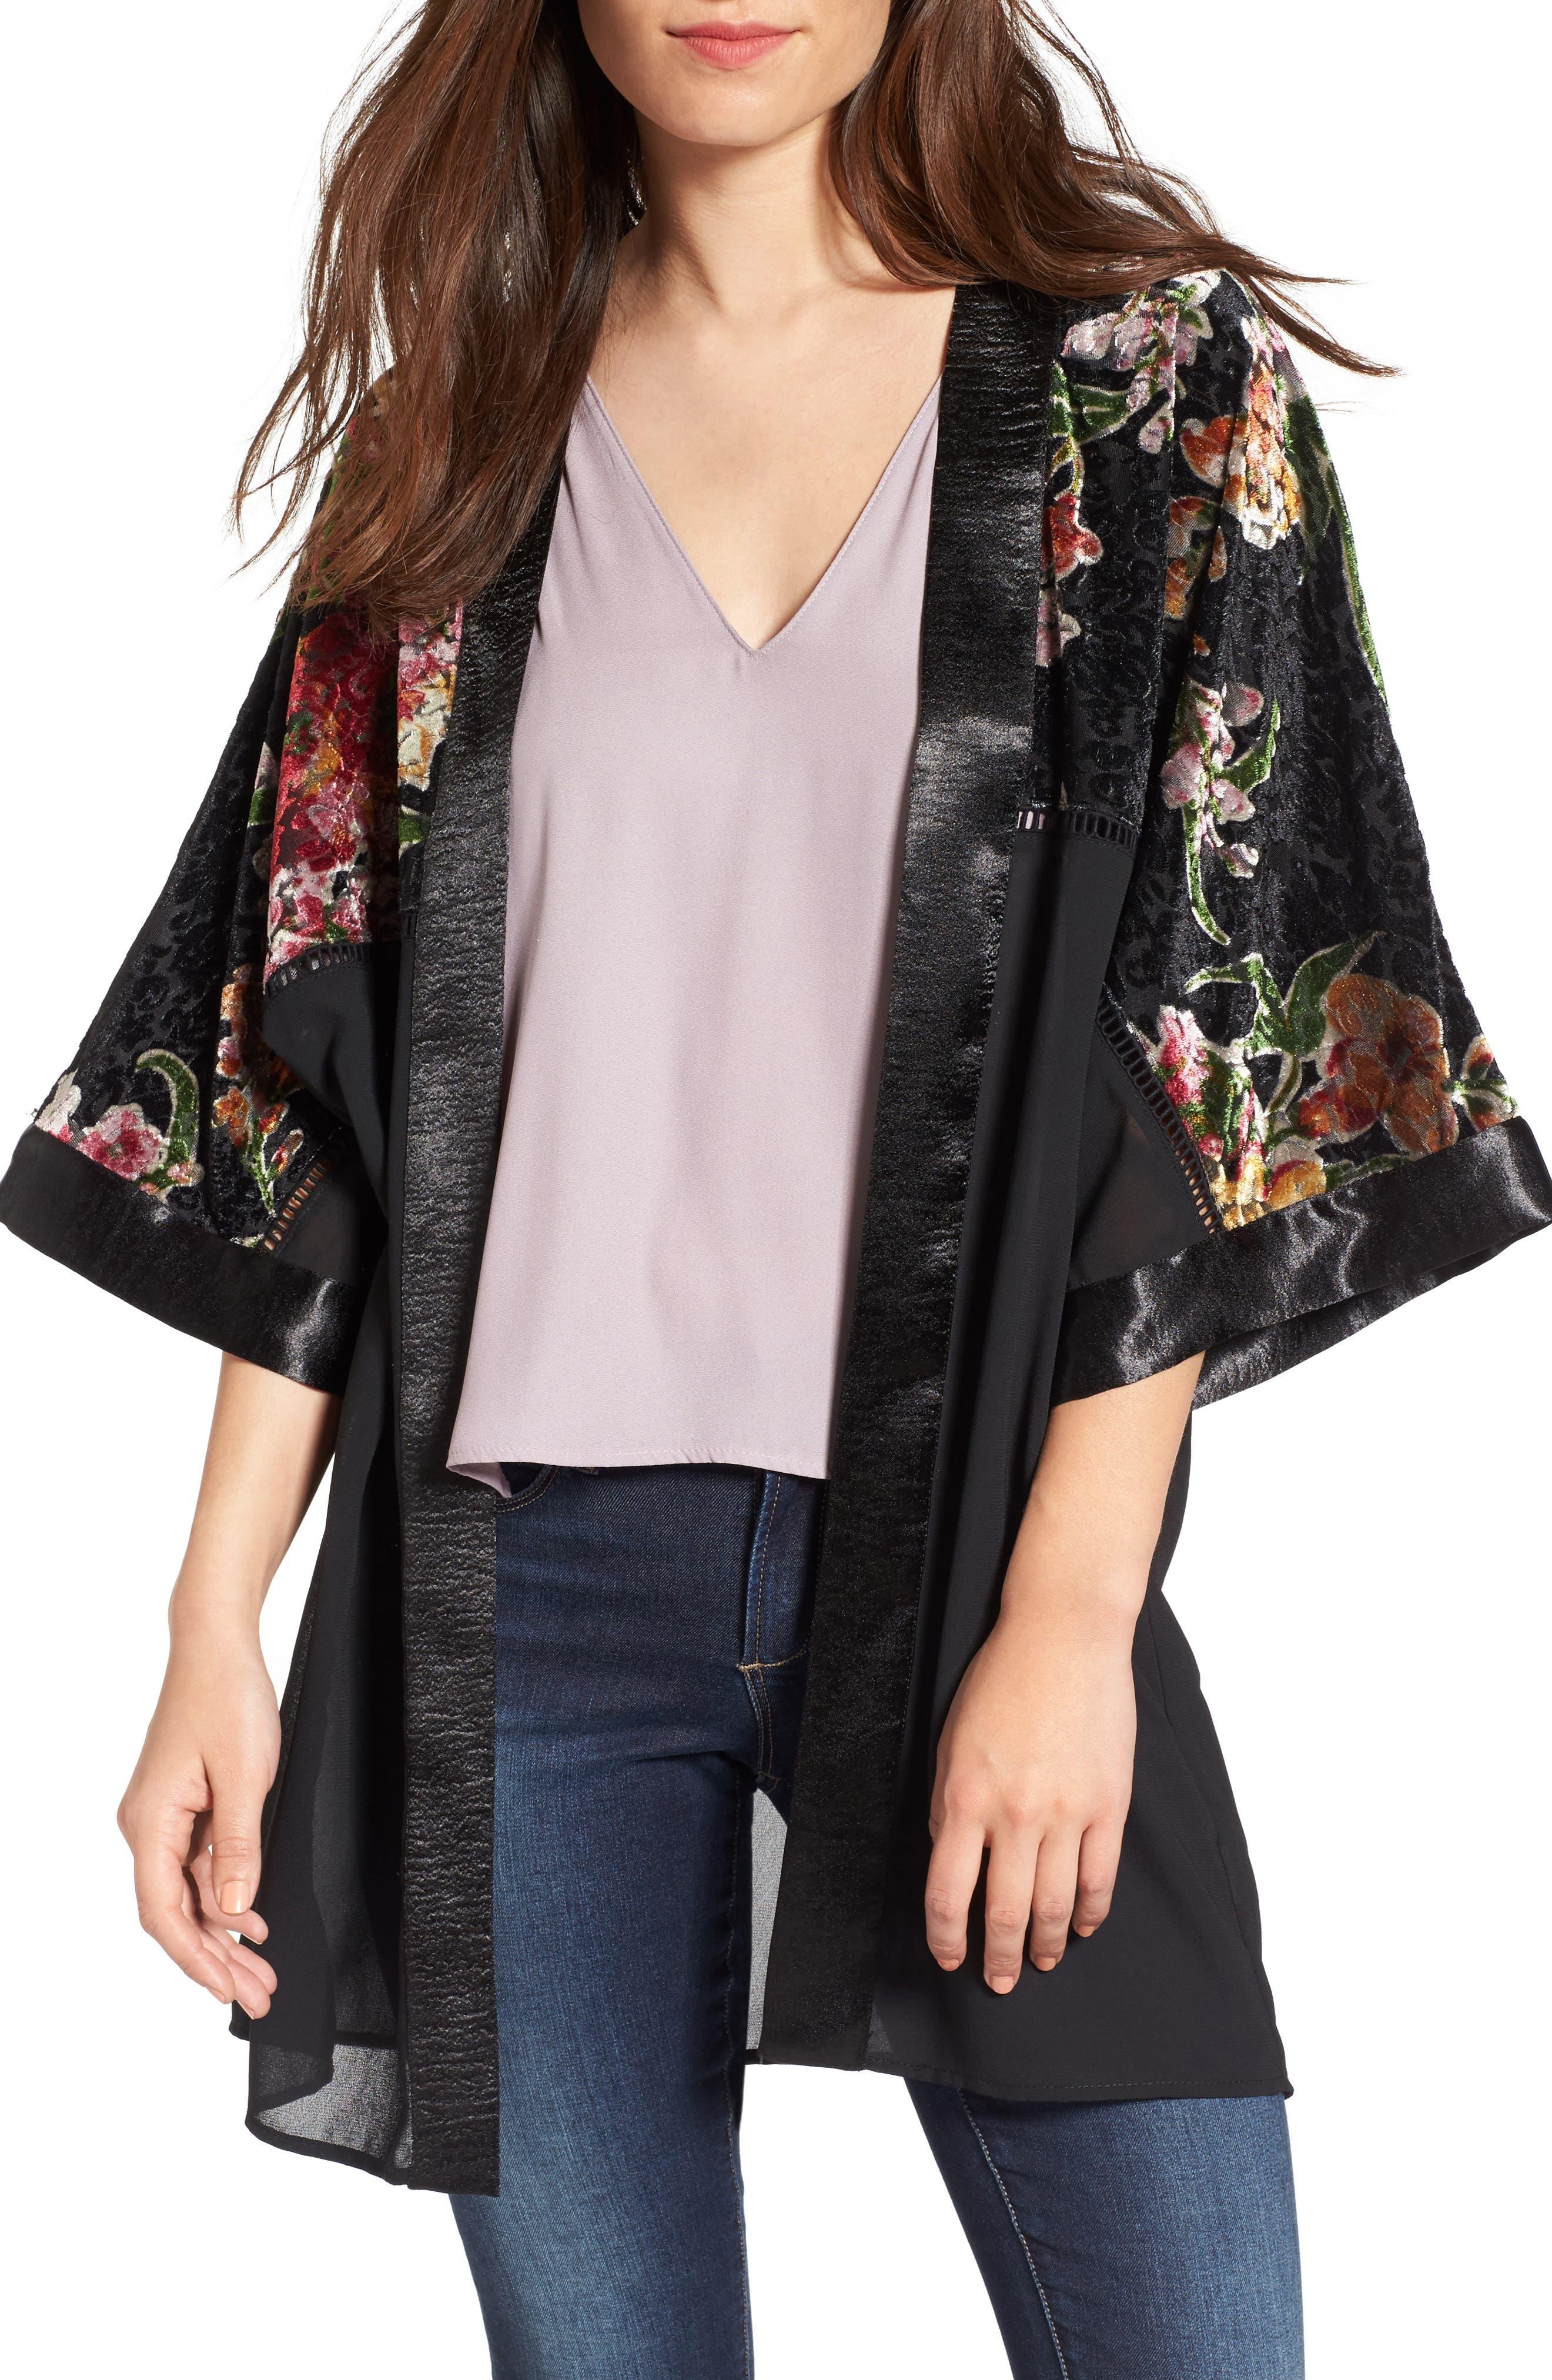 Main Image - Love, Fire Burnout Floral Kimono